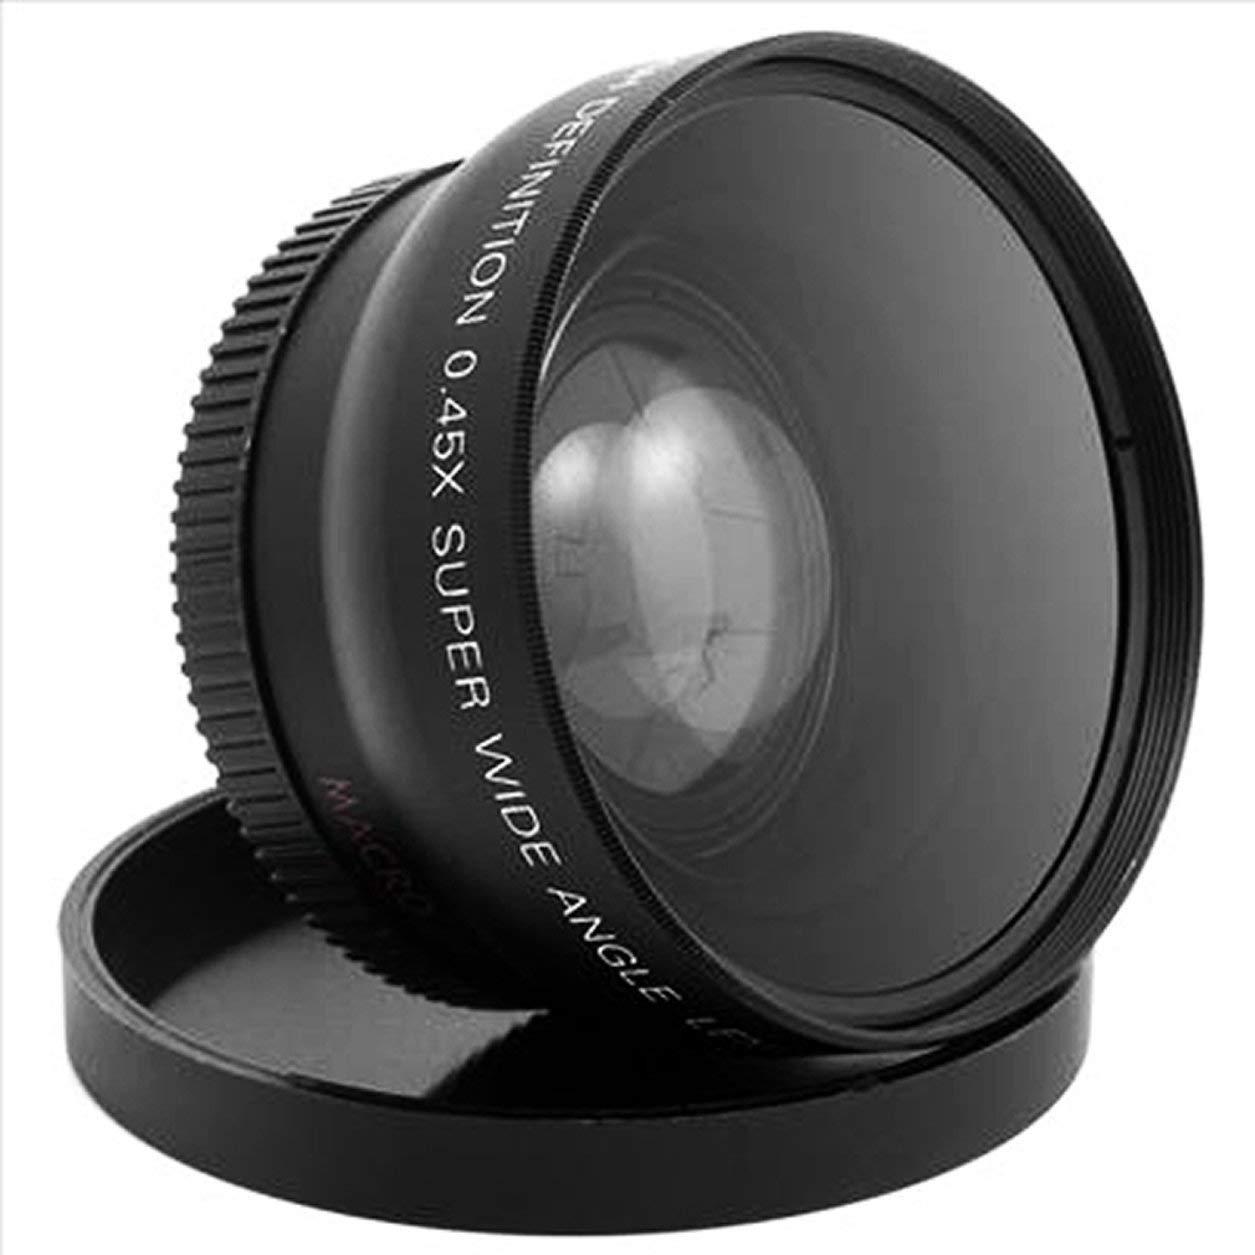 52mm x 0,45 Lente Macro Angular para Nikon D3200 D5100 D3100 D5200